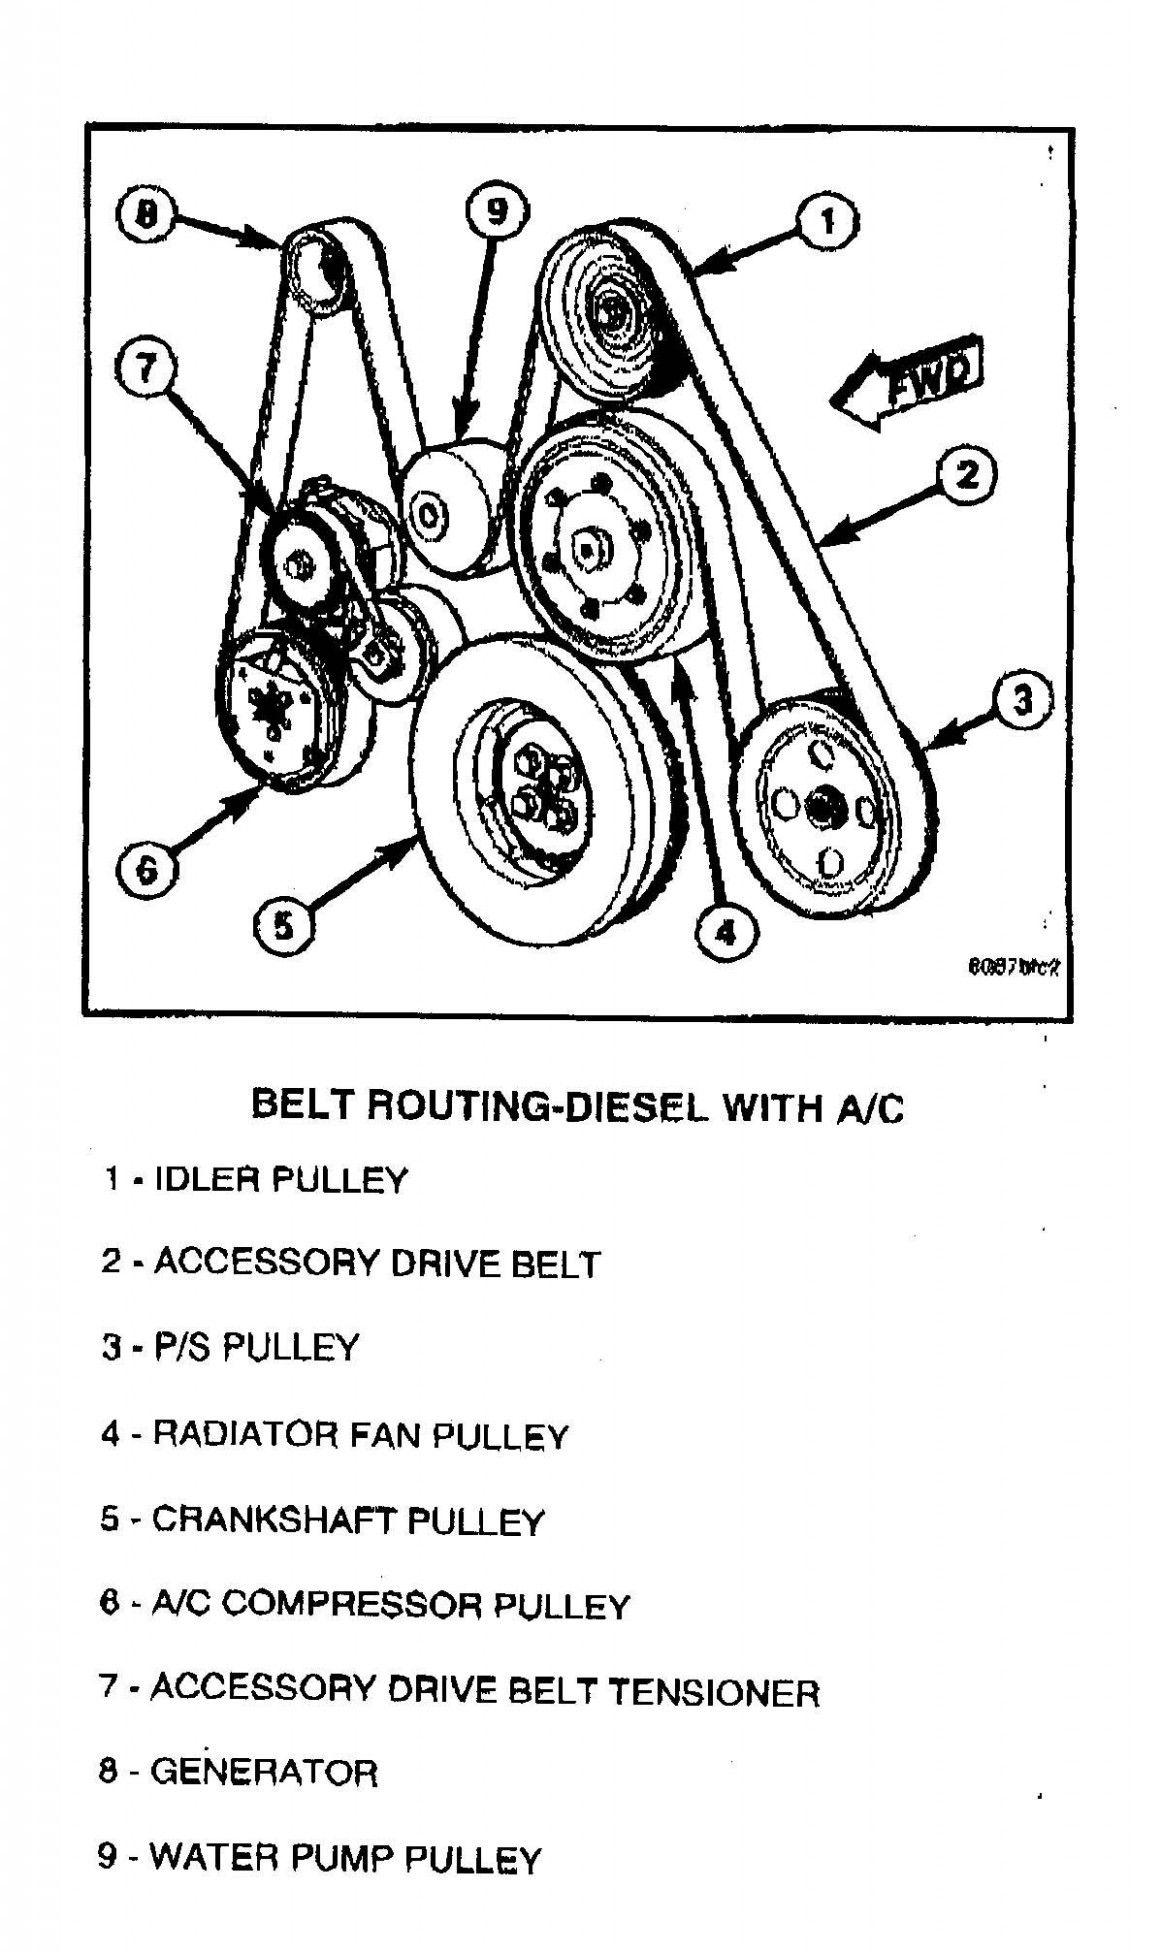 Mack Engine Belt Diagram di 2020